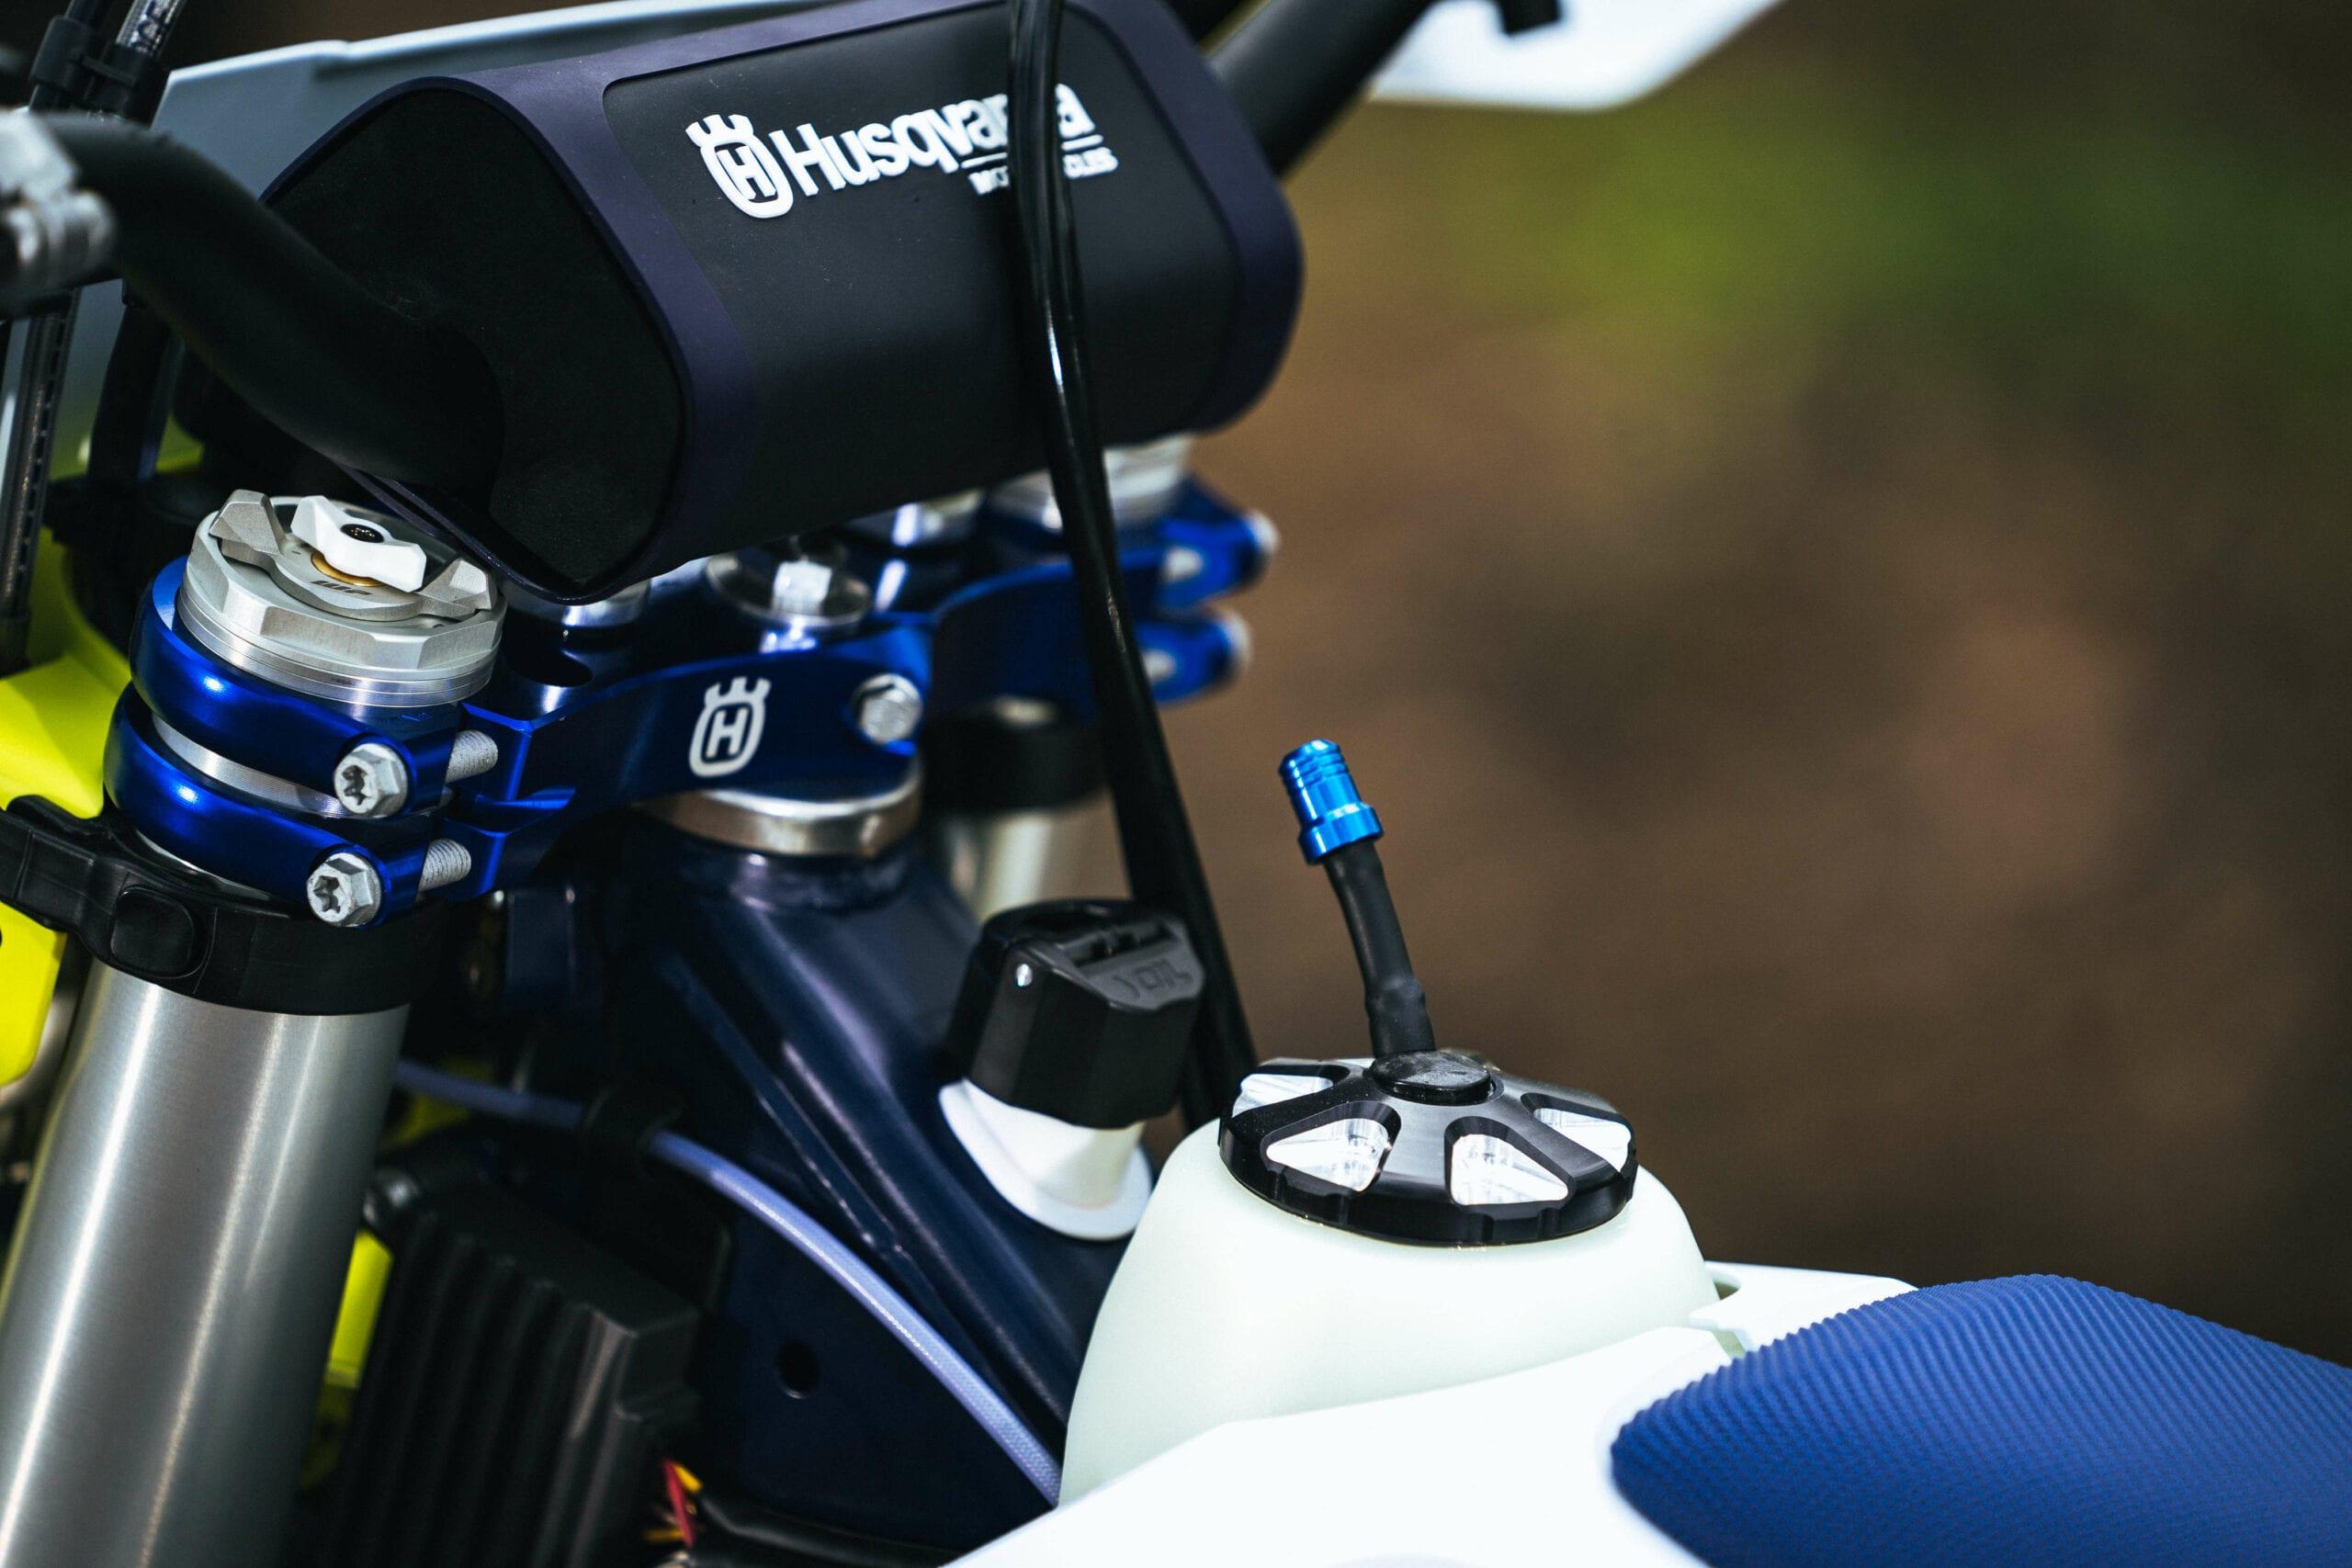 81307930000 Fuel tank cap vent Husqvarna motorcycles r4 moto's